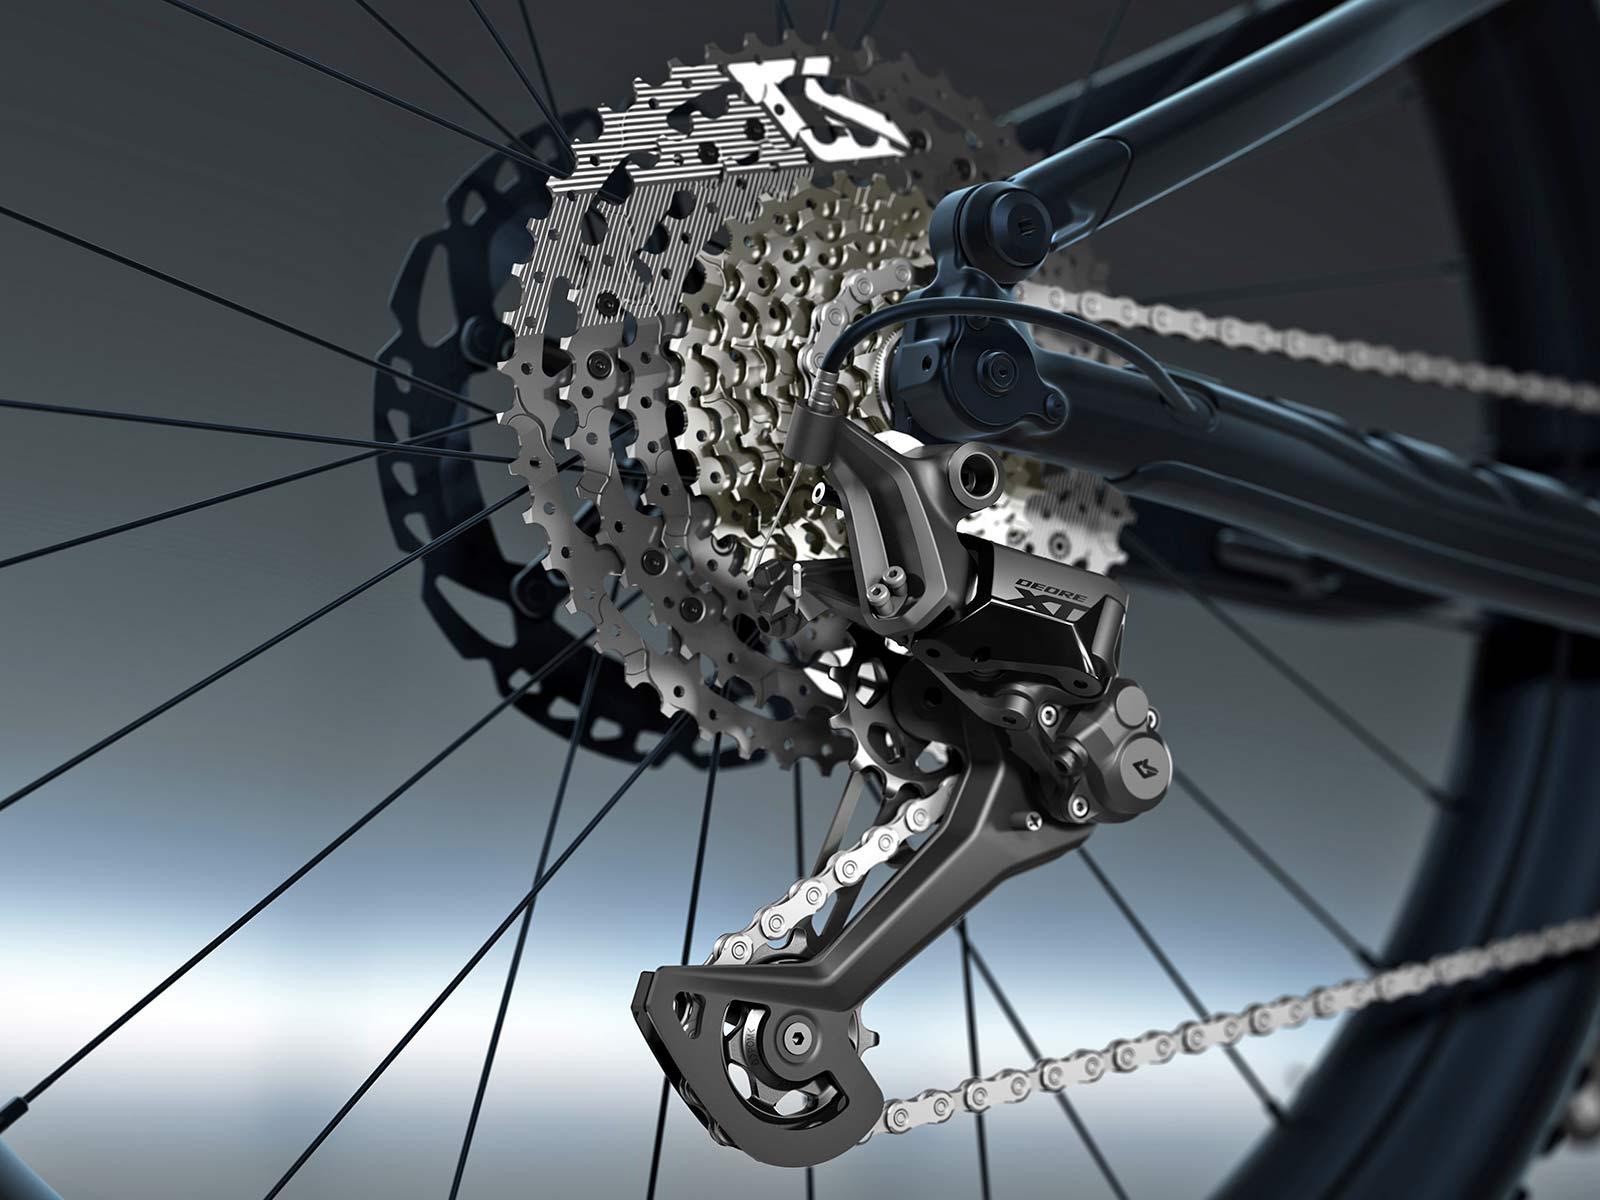 Shimano Deore XT LinkGlide drivetrain is 3x more durable, new LG MTB long-wearing mountain bike groupset,XT LG derailleur